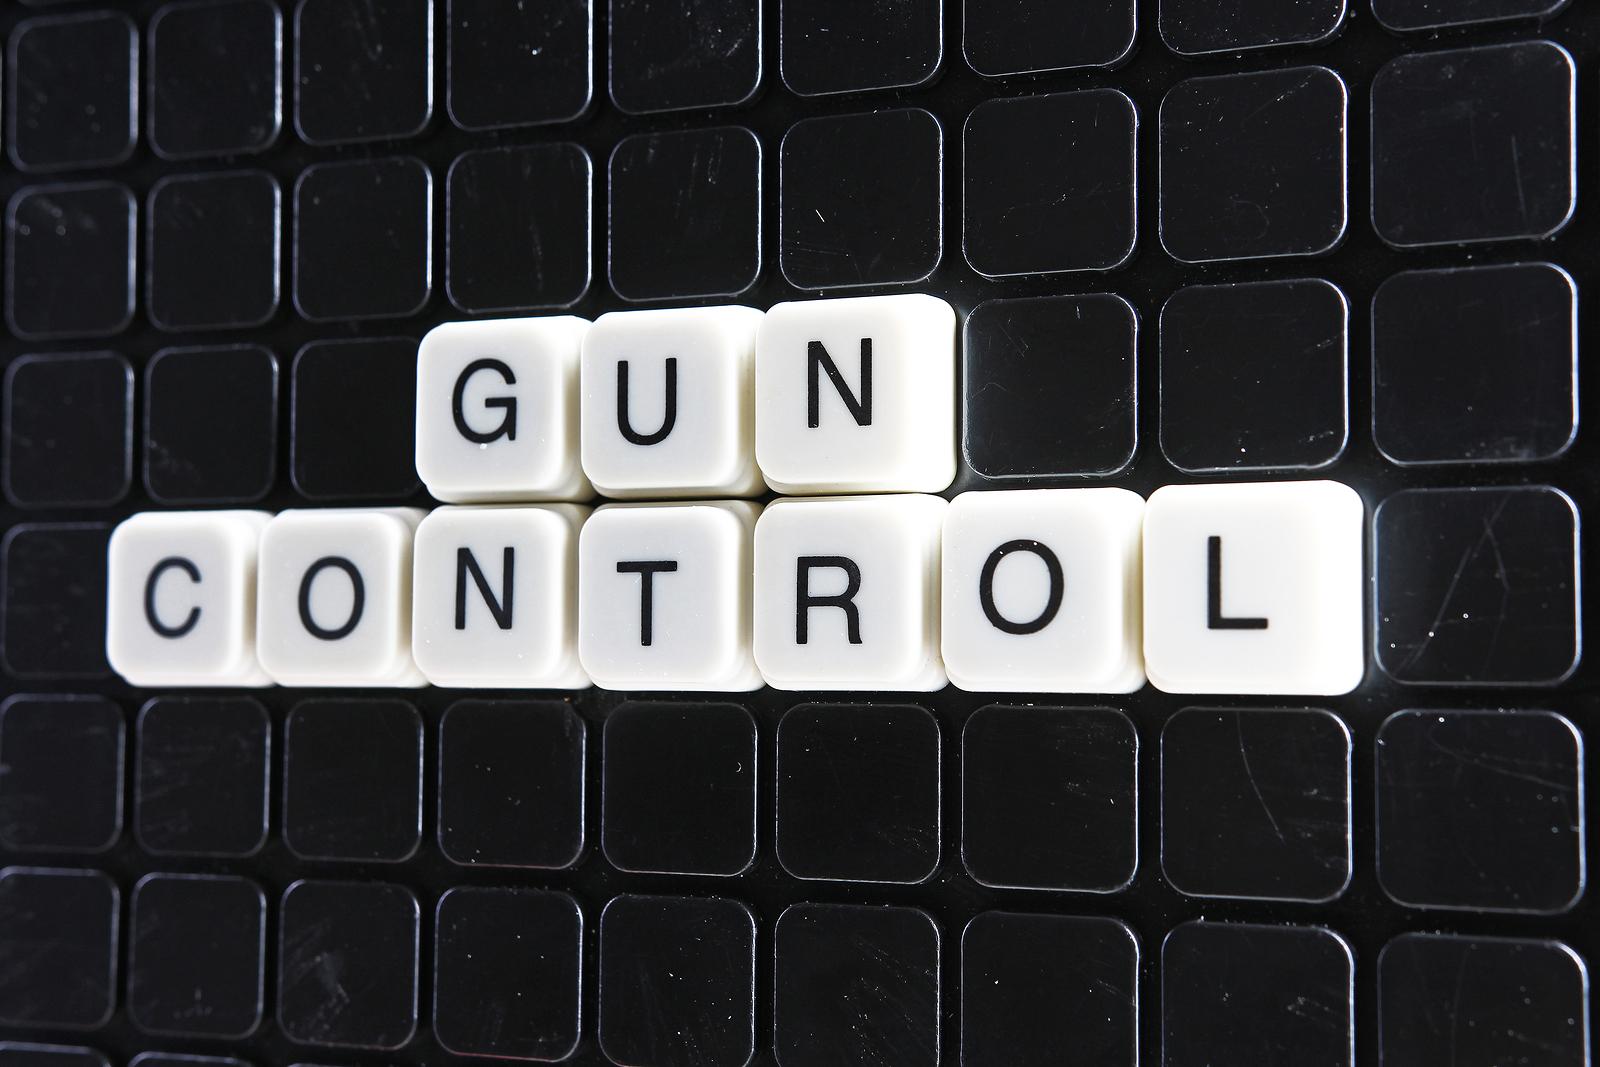 Gun violence prevention resolution moving forward